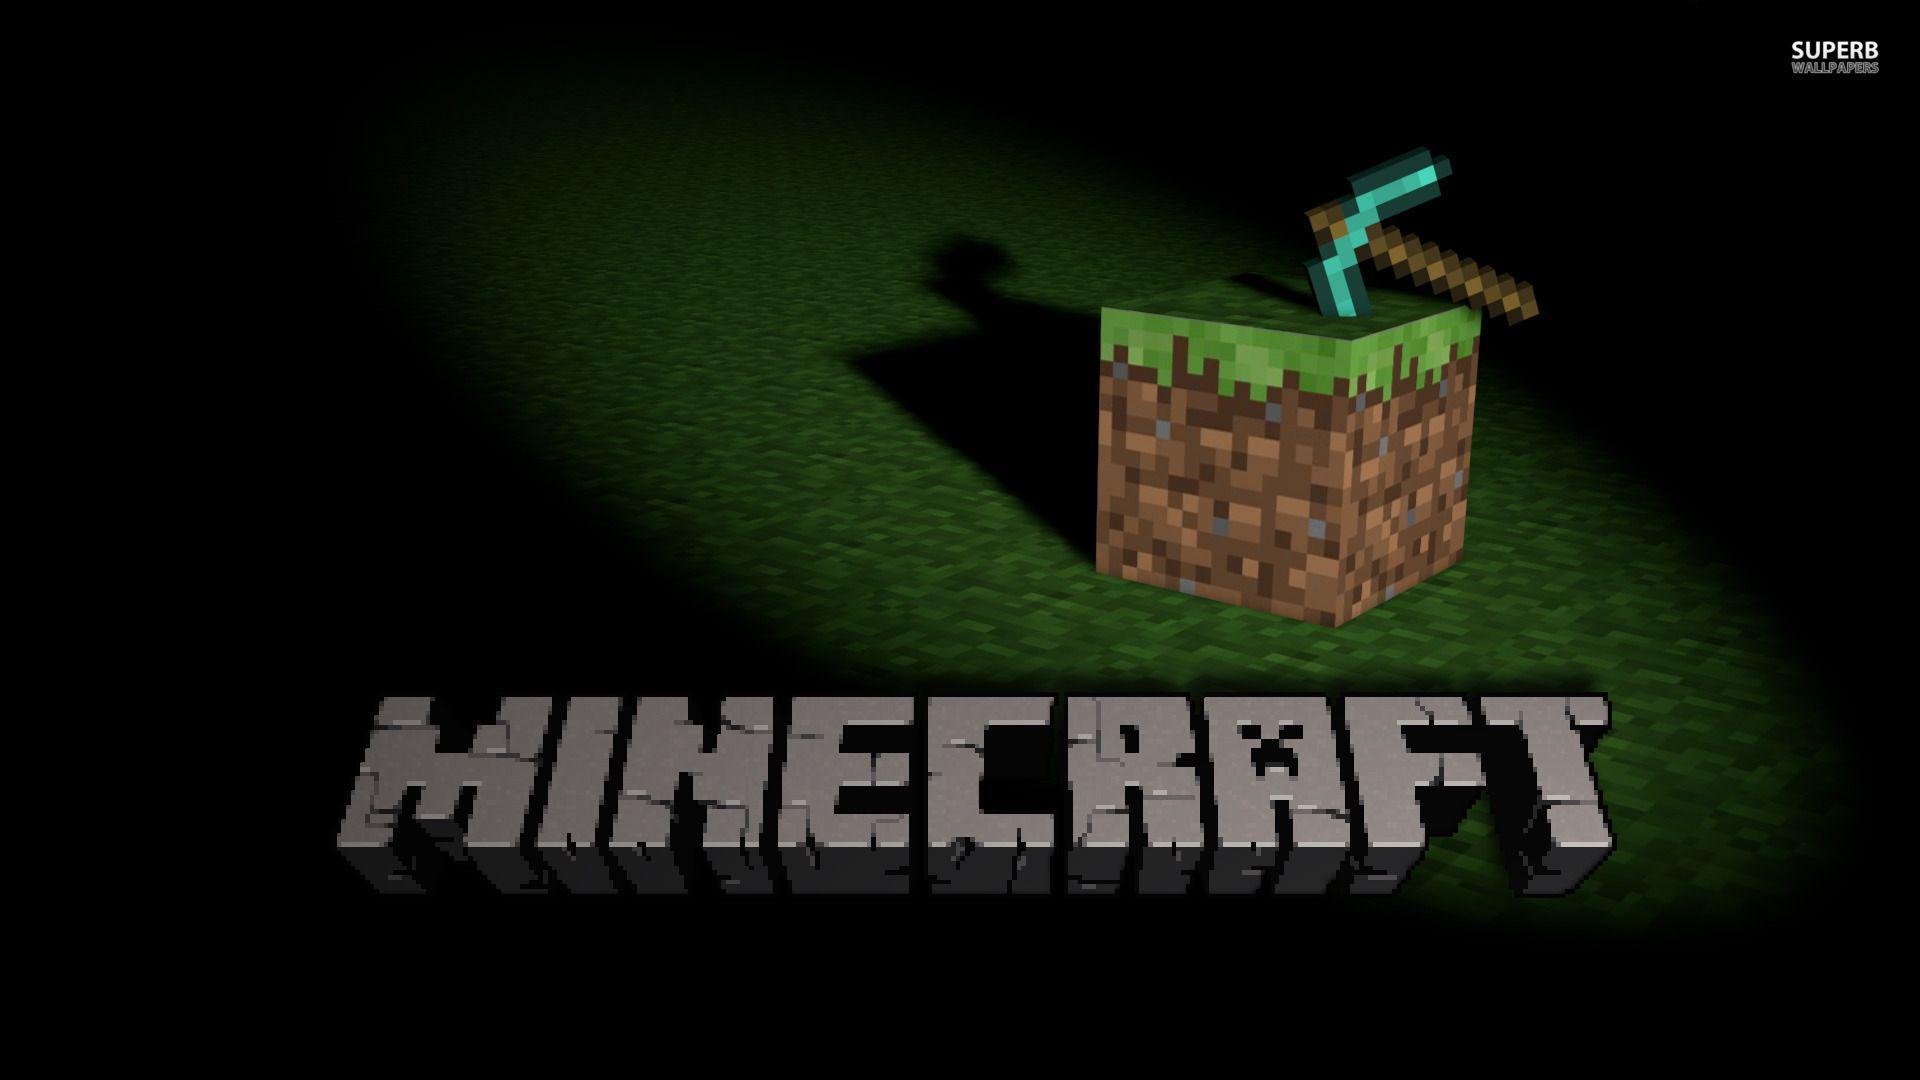 Gaming Minecraft Wallpaper Hd - Novocom.top